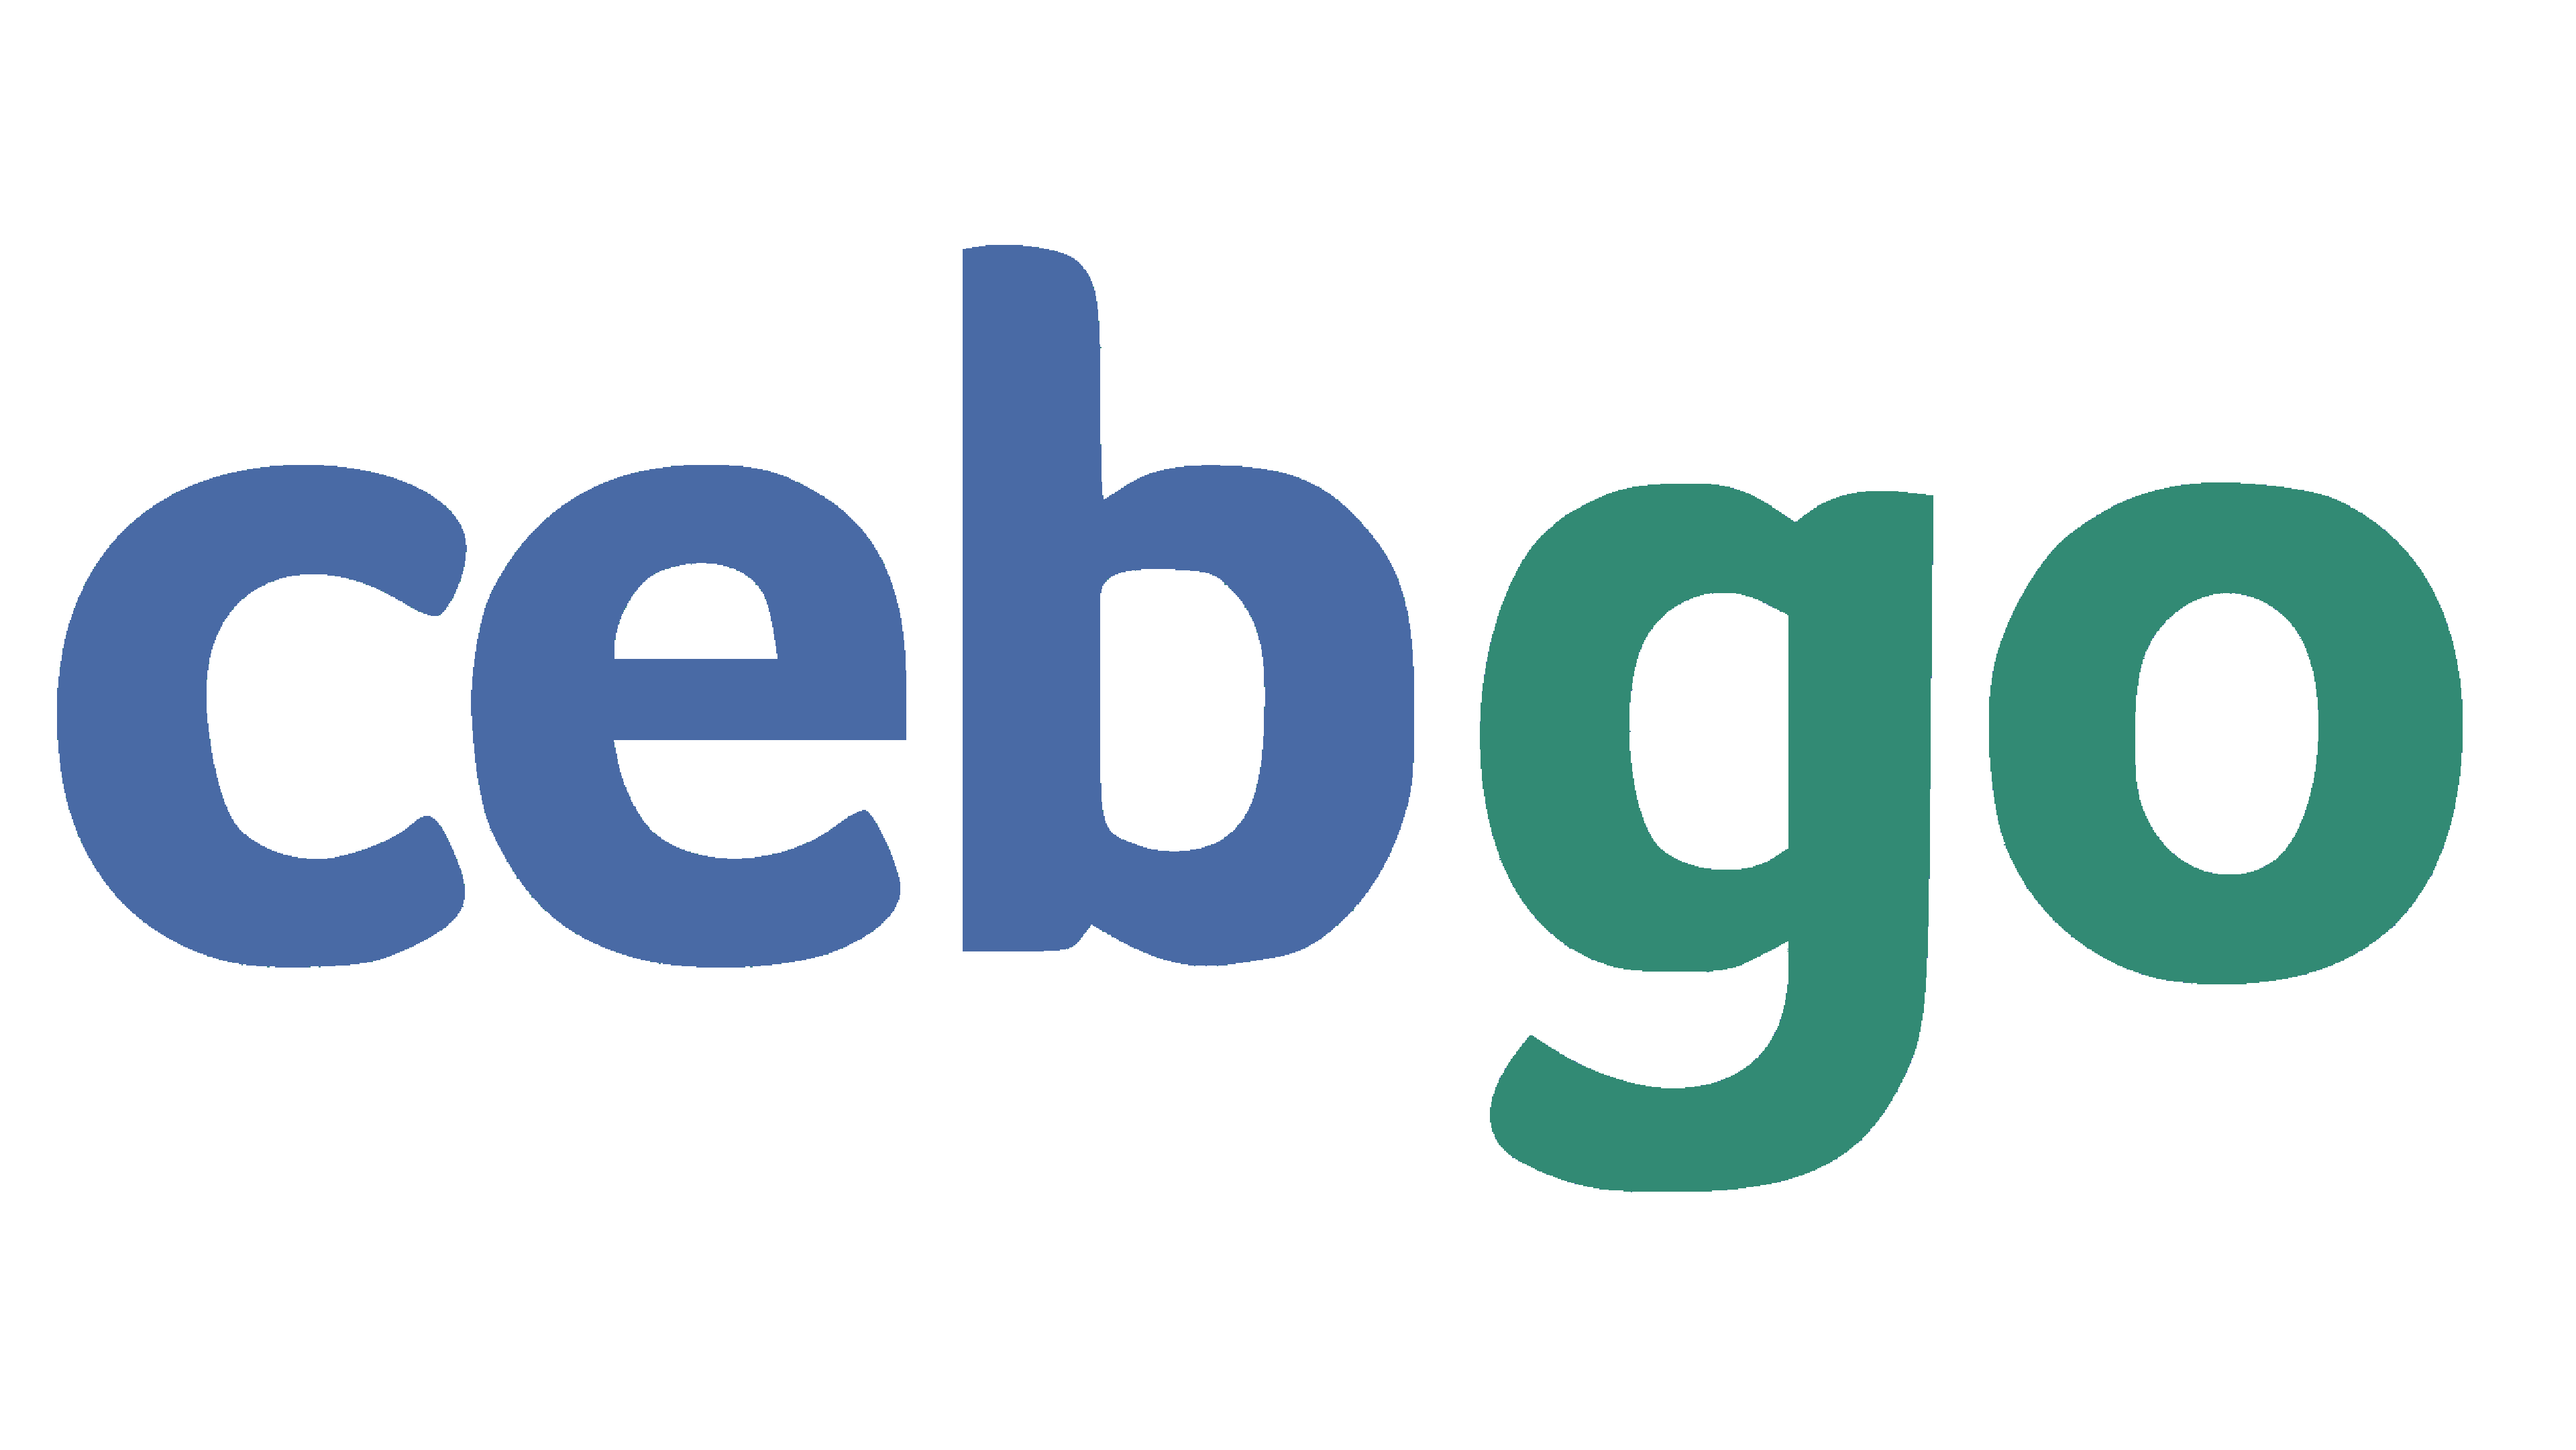 Cebgo Logo Logo